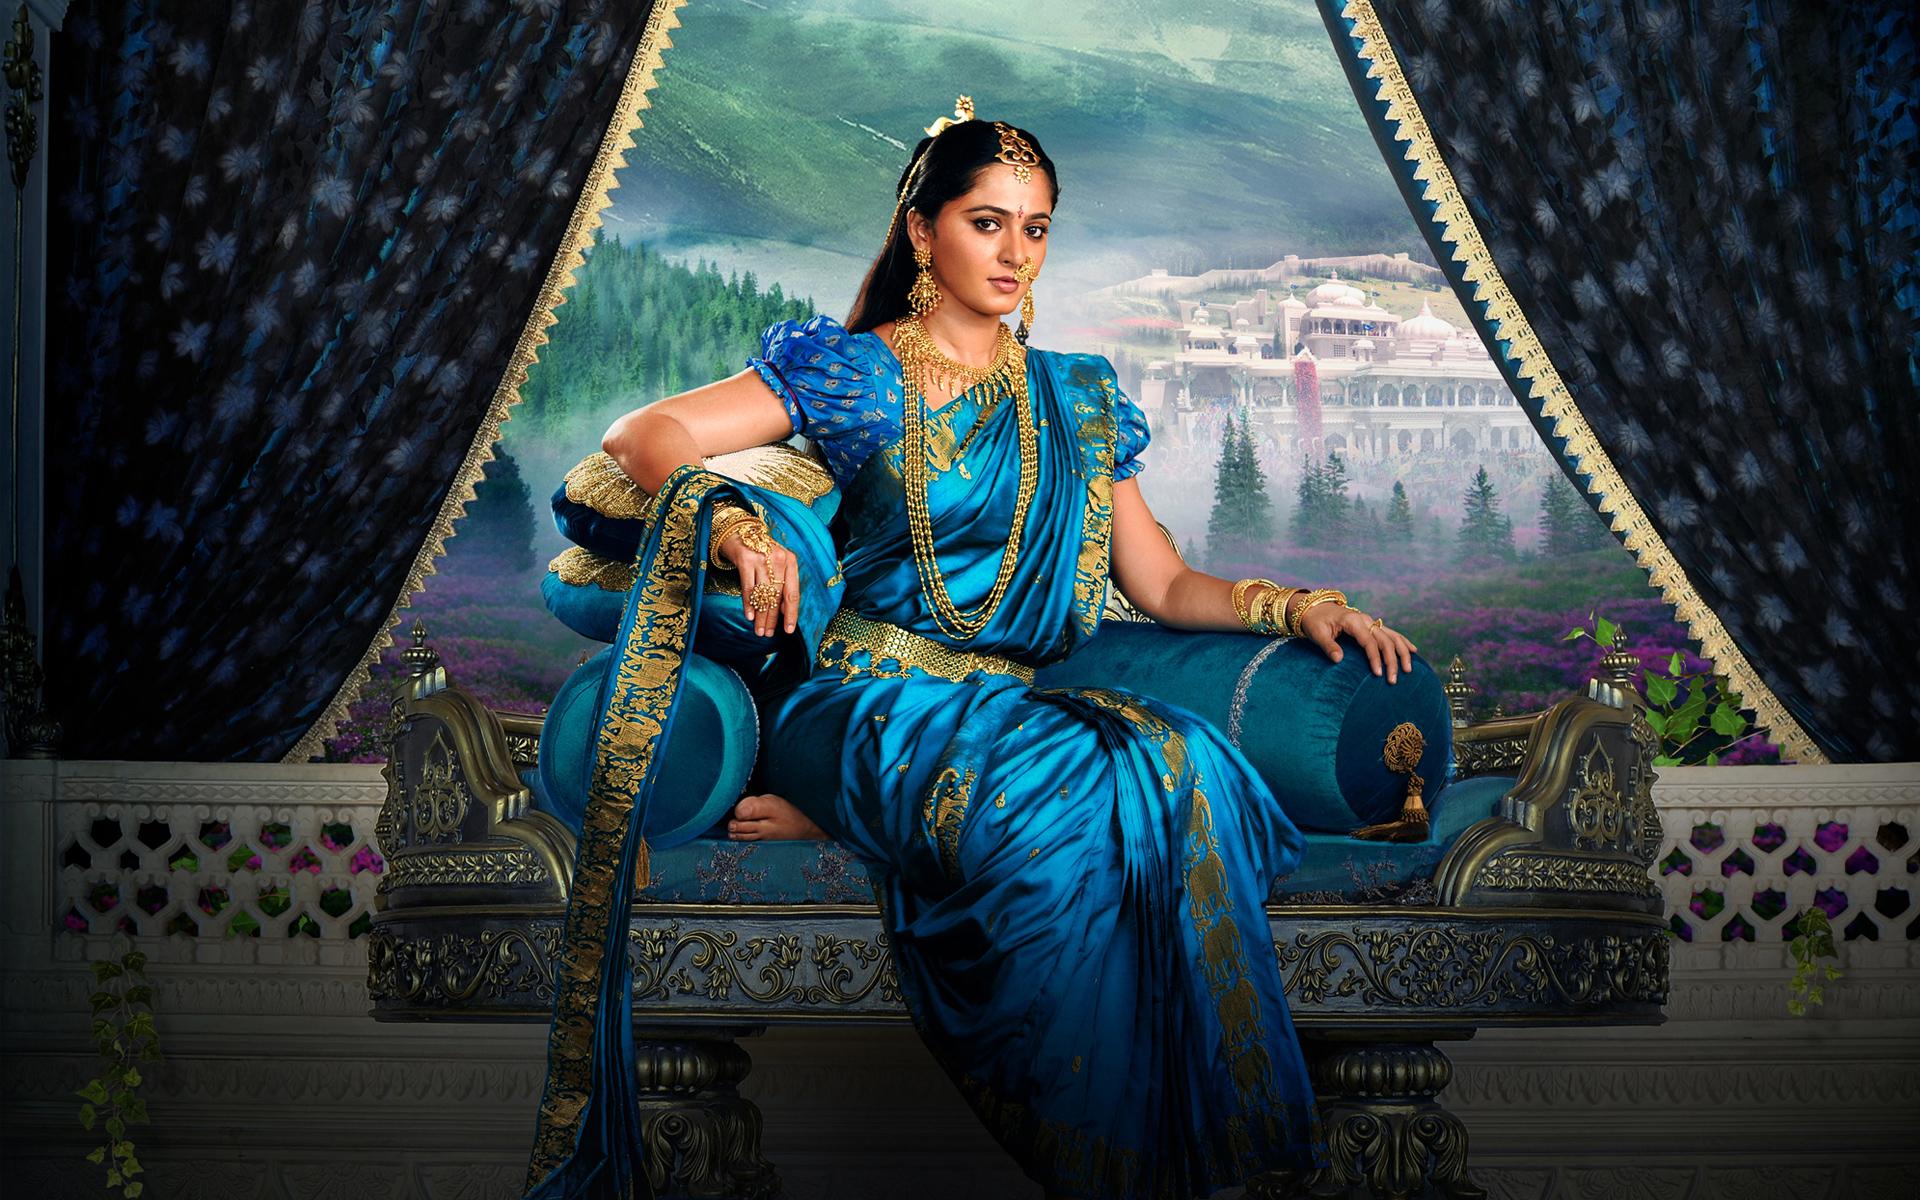 Anushka Shetty As Devasena In Baahubali 2 Wallpapers Hd Wallpapers